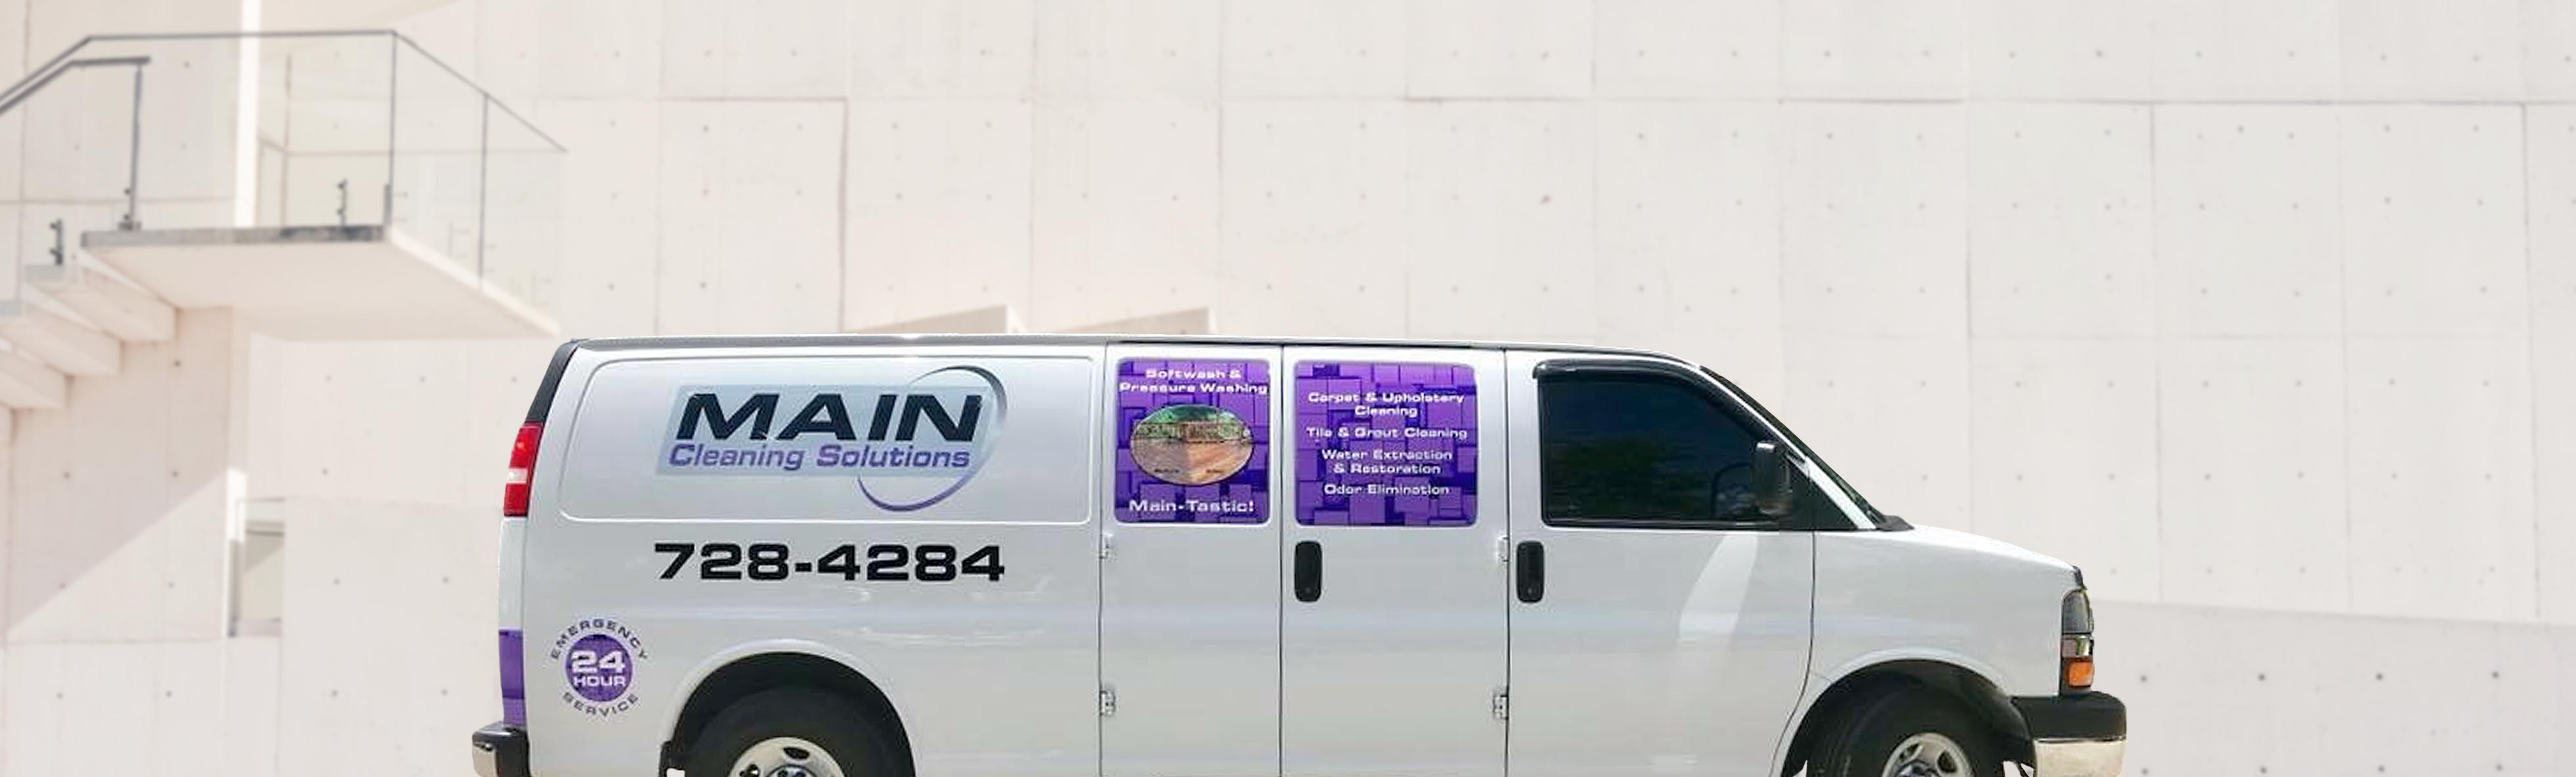 Main Cleaning Solutions homepage Image of van